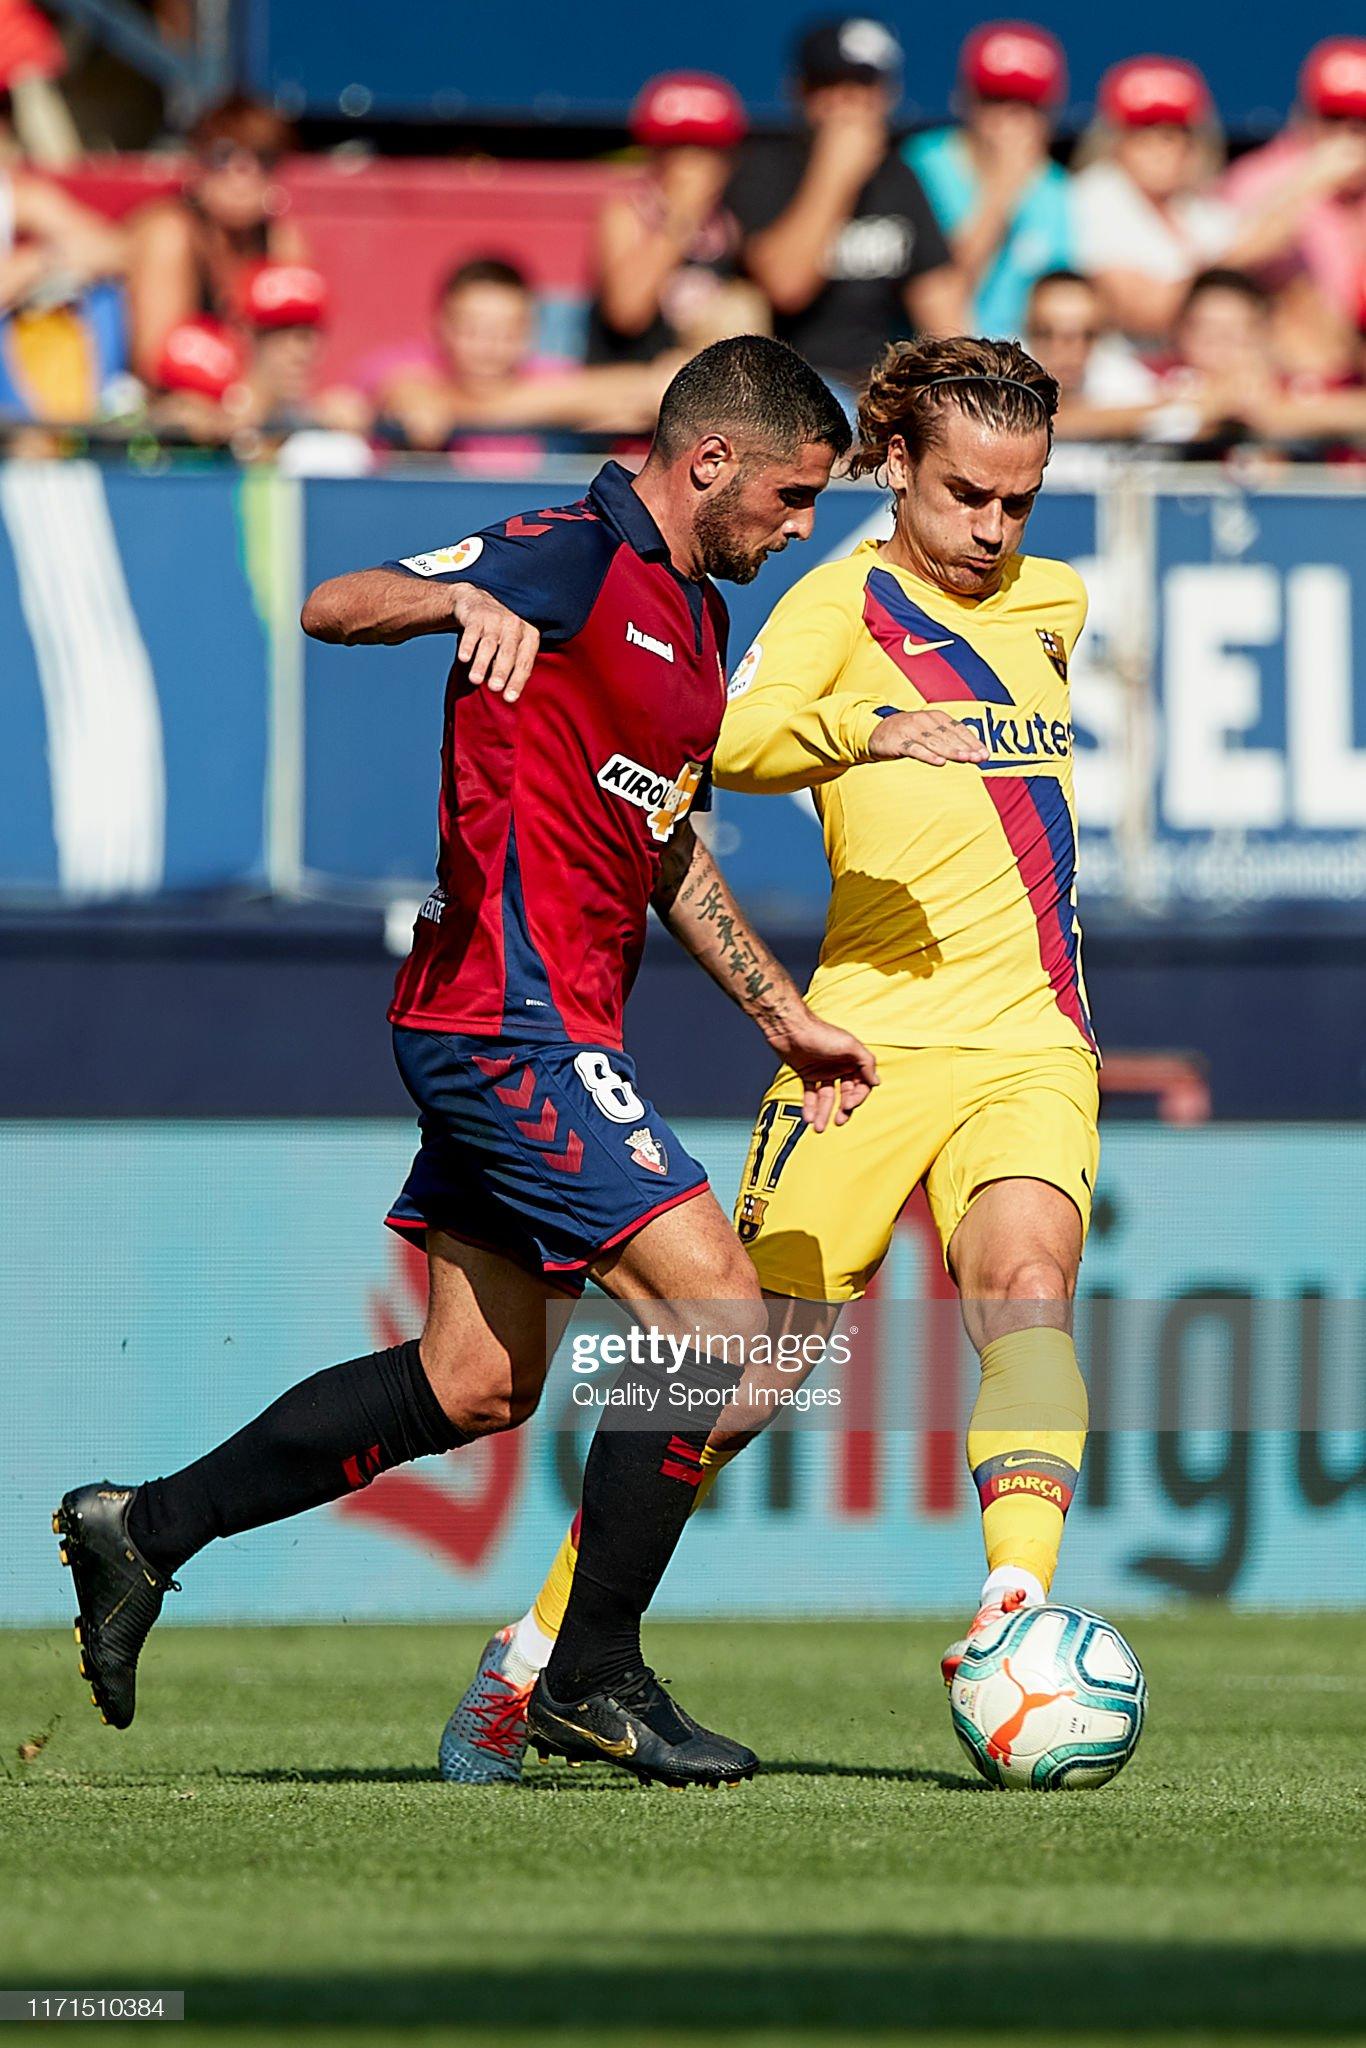 صور مباراة : أوساسونا - برشلونة 2-2 ( 31-08-2019 )  Fran-merida-of-ca-osasuna-competes-for-the-ball-with-antoine-of-fc-picture-id1171510384?s=2048x2048